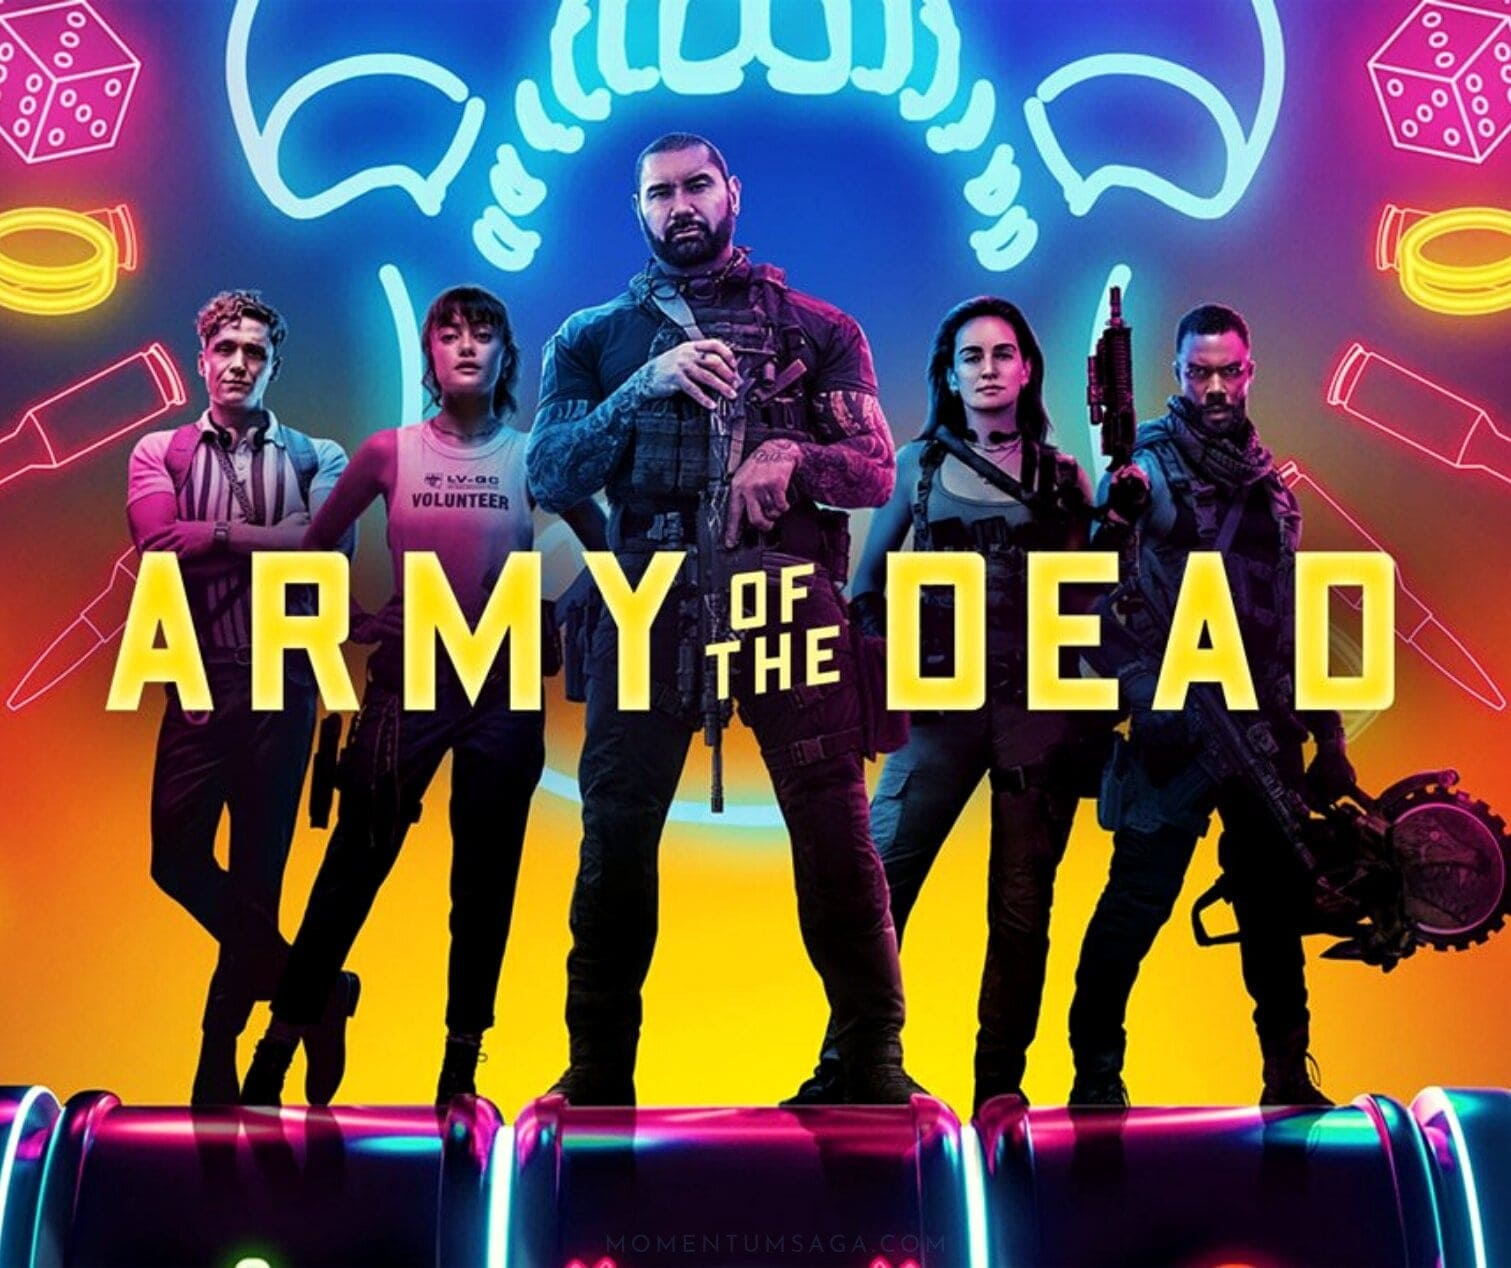 Army of the Dead: em defesa dos filmes farofa